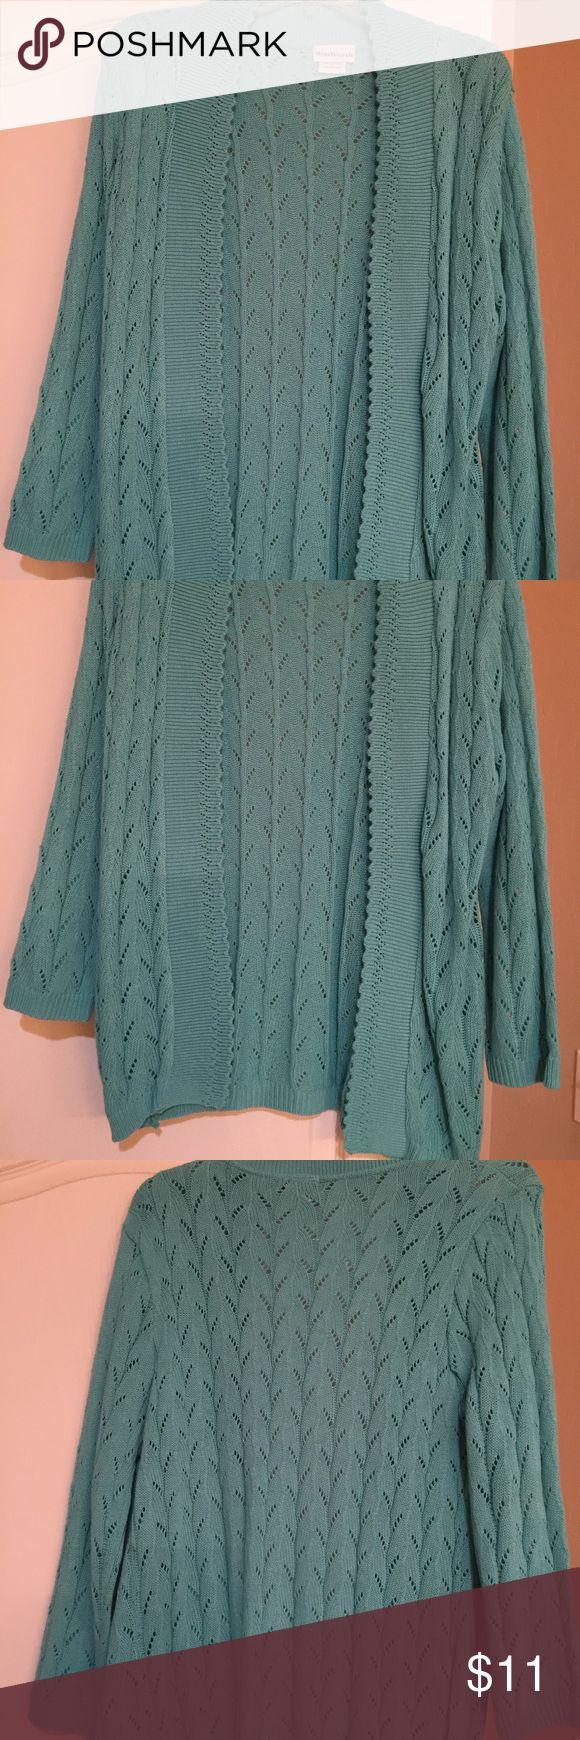 Turquoise cardigan size sm Turquoise cardigan size sm never worn Sweaters Cardigans